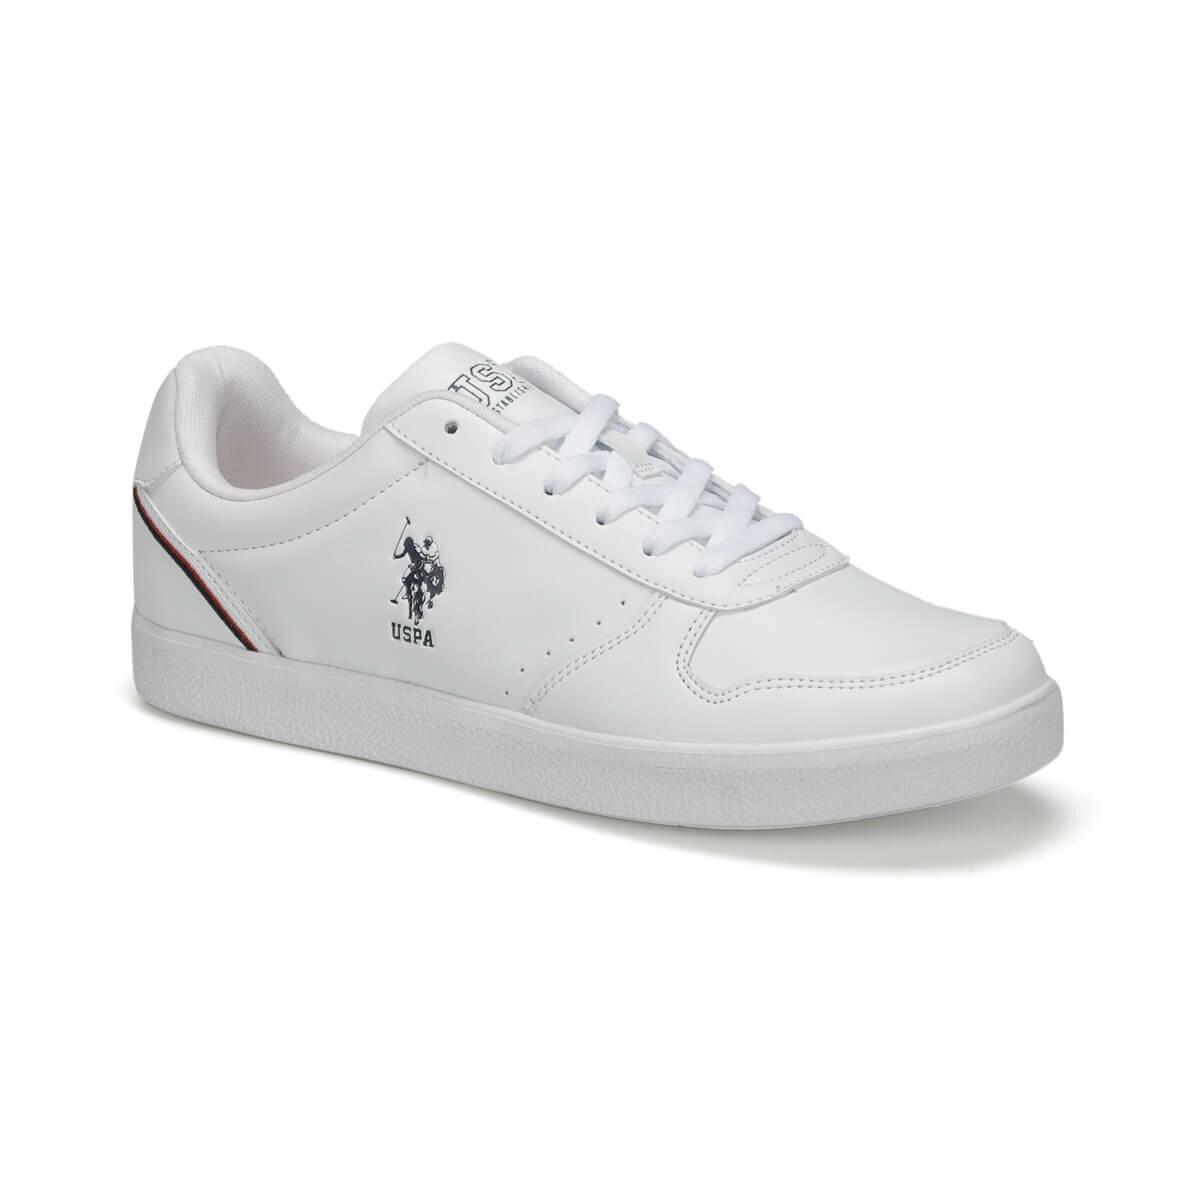 FLO JACKSON 9PR White Men 'S Sneaker Shoes U.S. POLO ASSN.